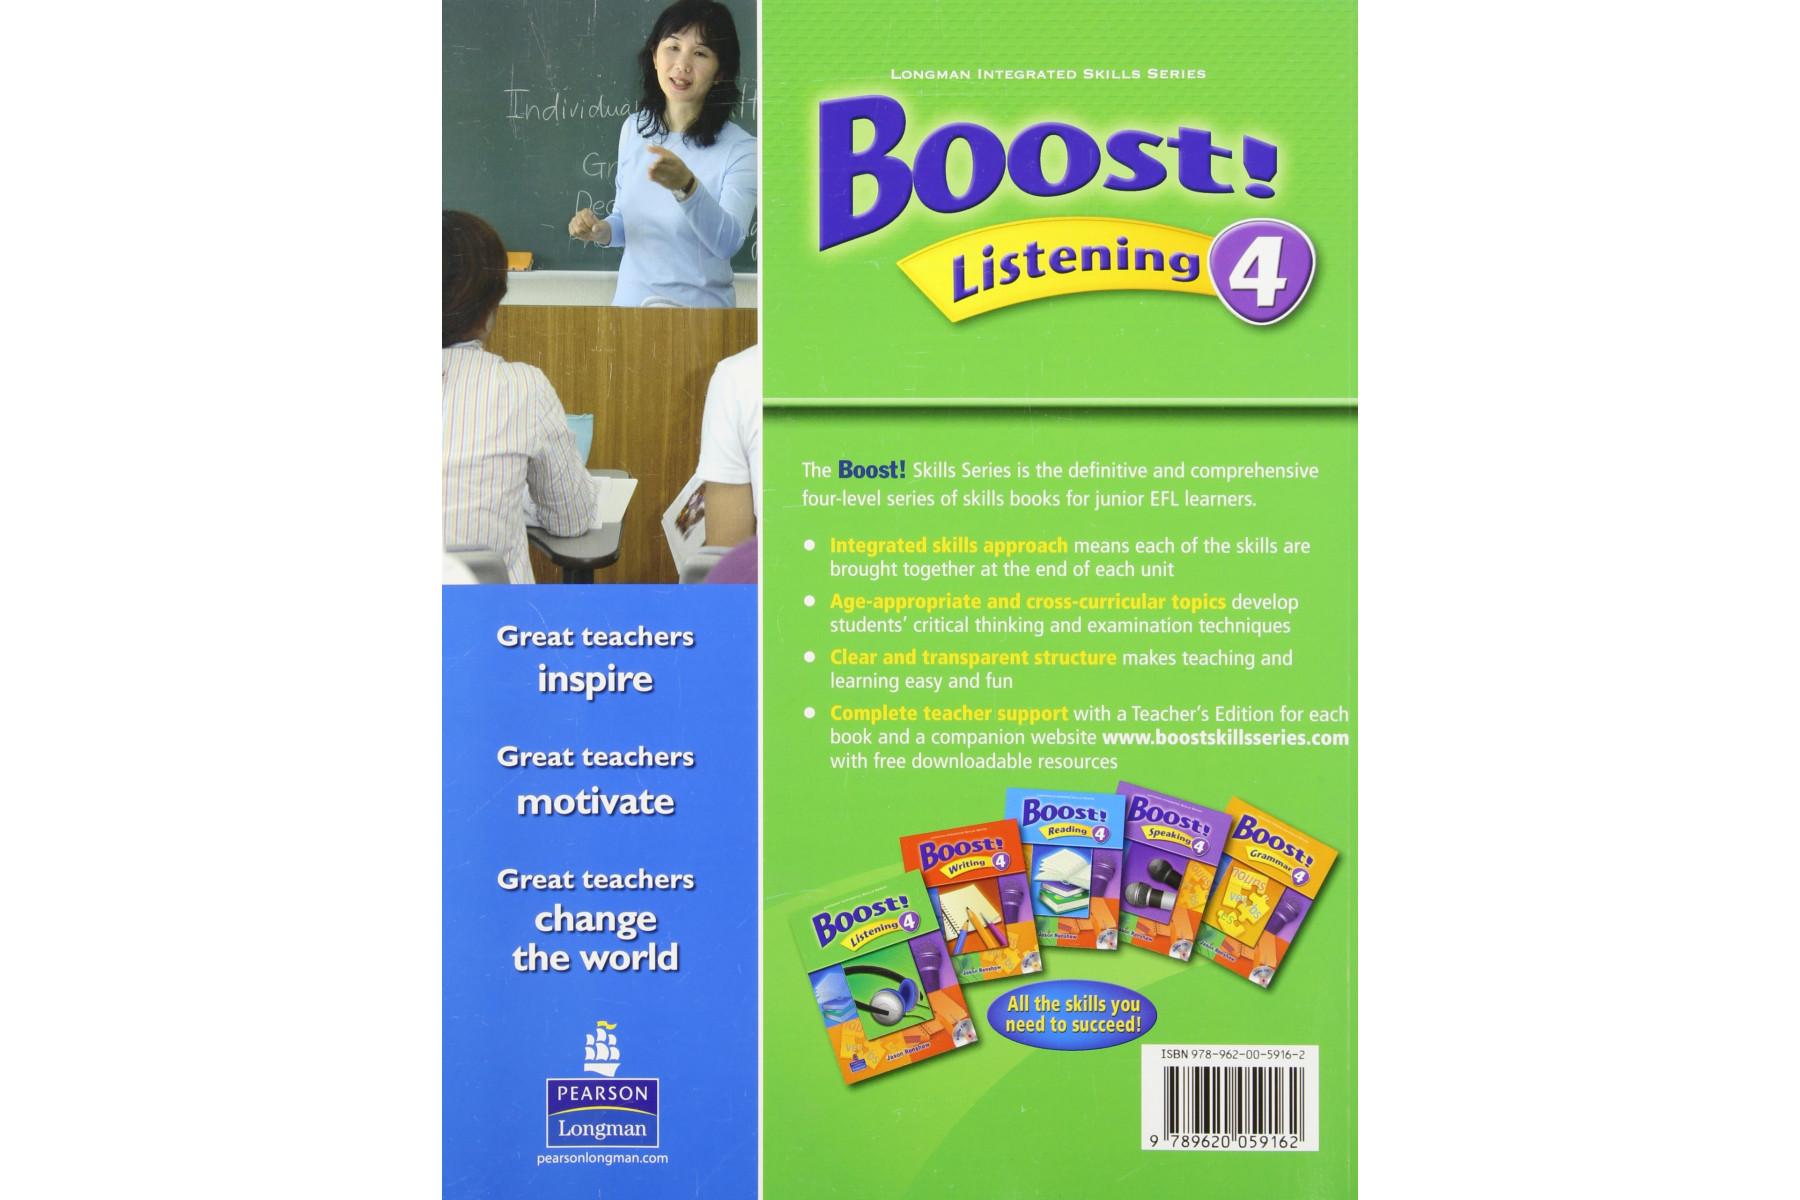 Boost! Listening 4 Teachers Edition